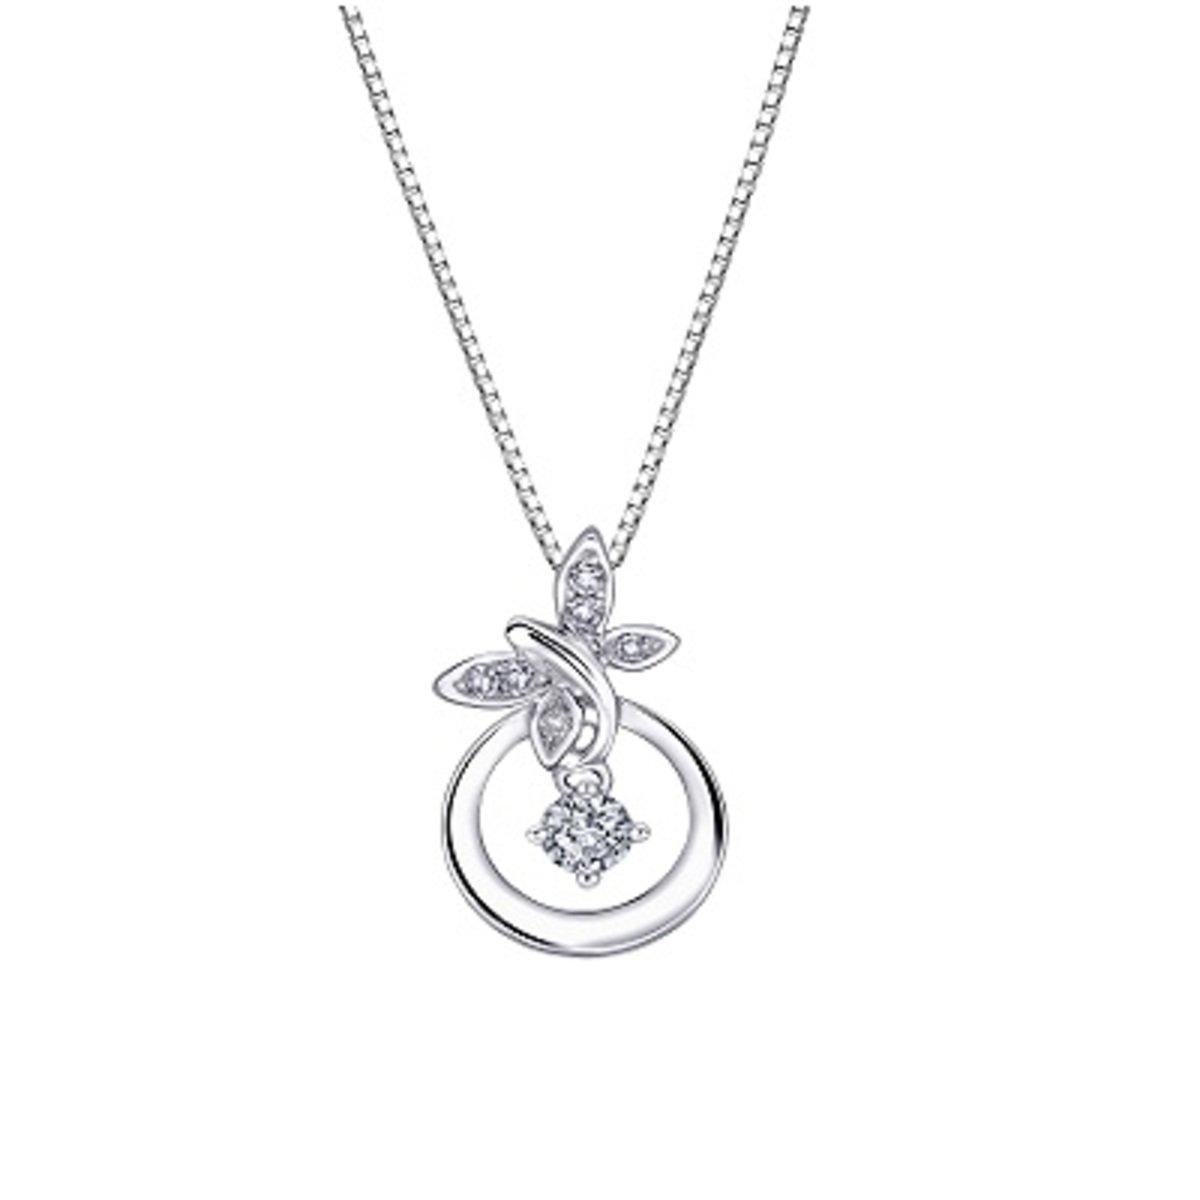 18K/750 白色黃金鑽石鑲嵌蝴蝶吊墜 (此吊墜不包括項鍊)